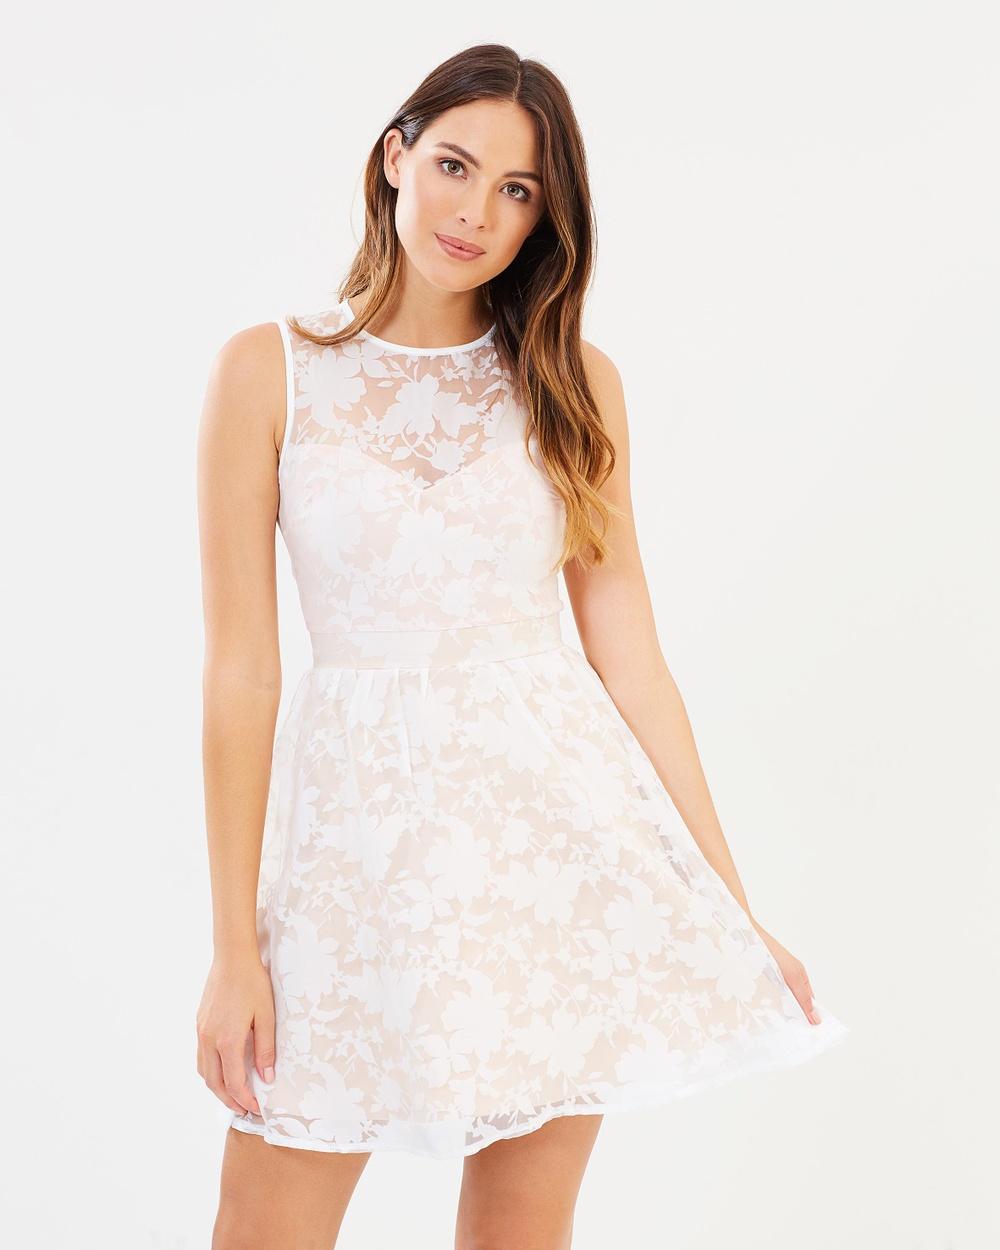 Lipsy Burnout Skirt Dress Dresses Nude Burnout Skirt Dress